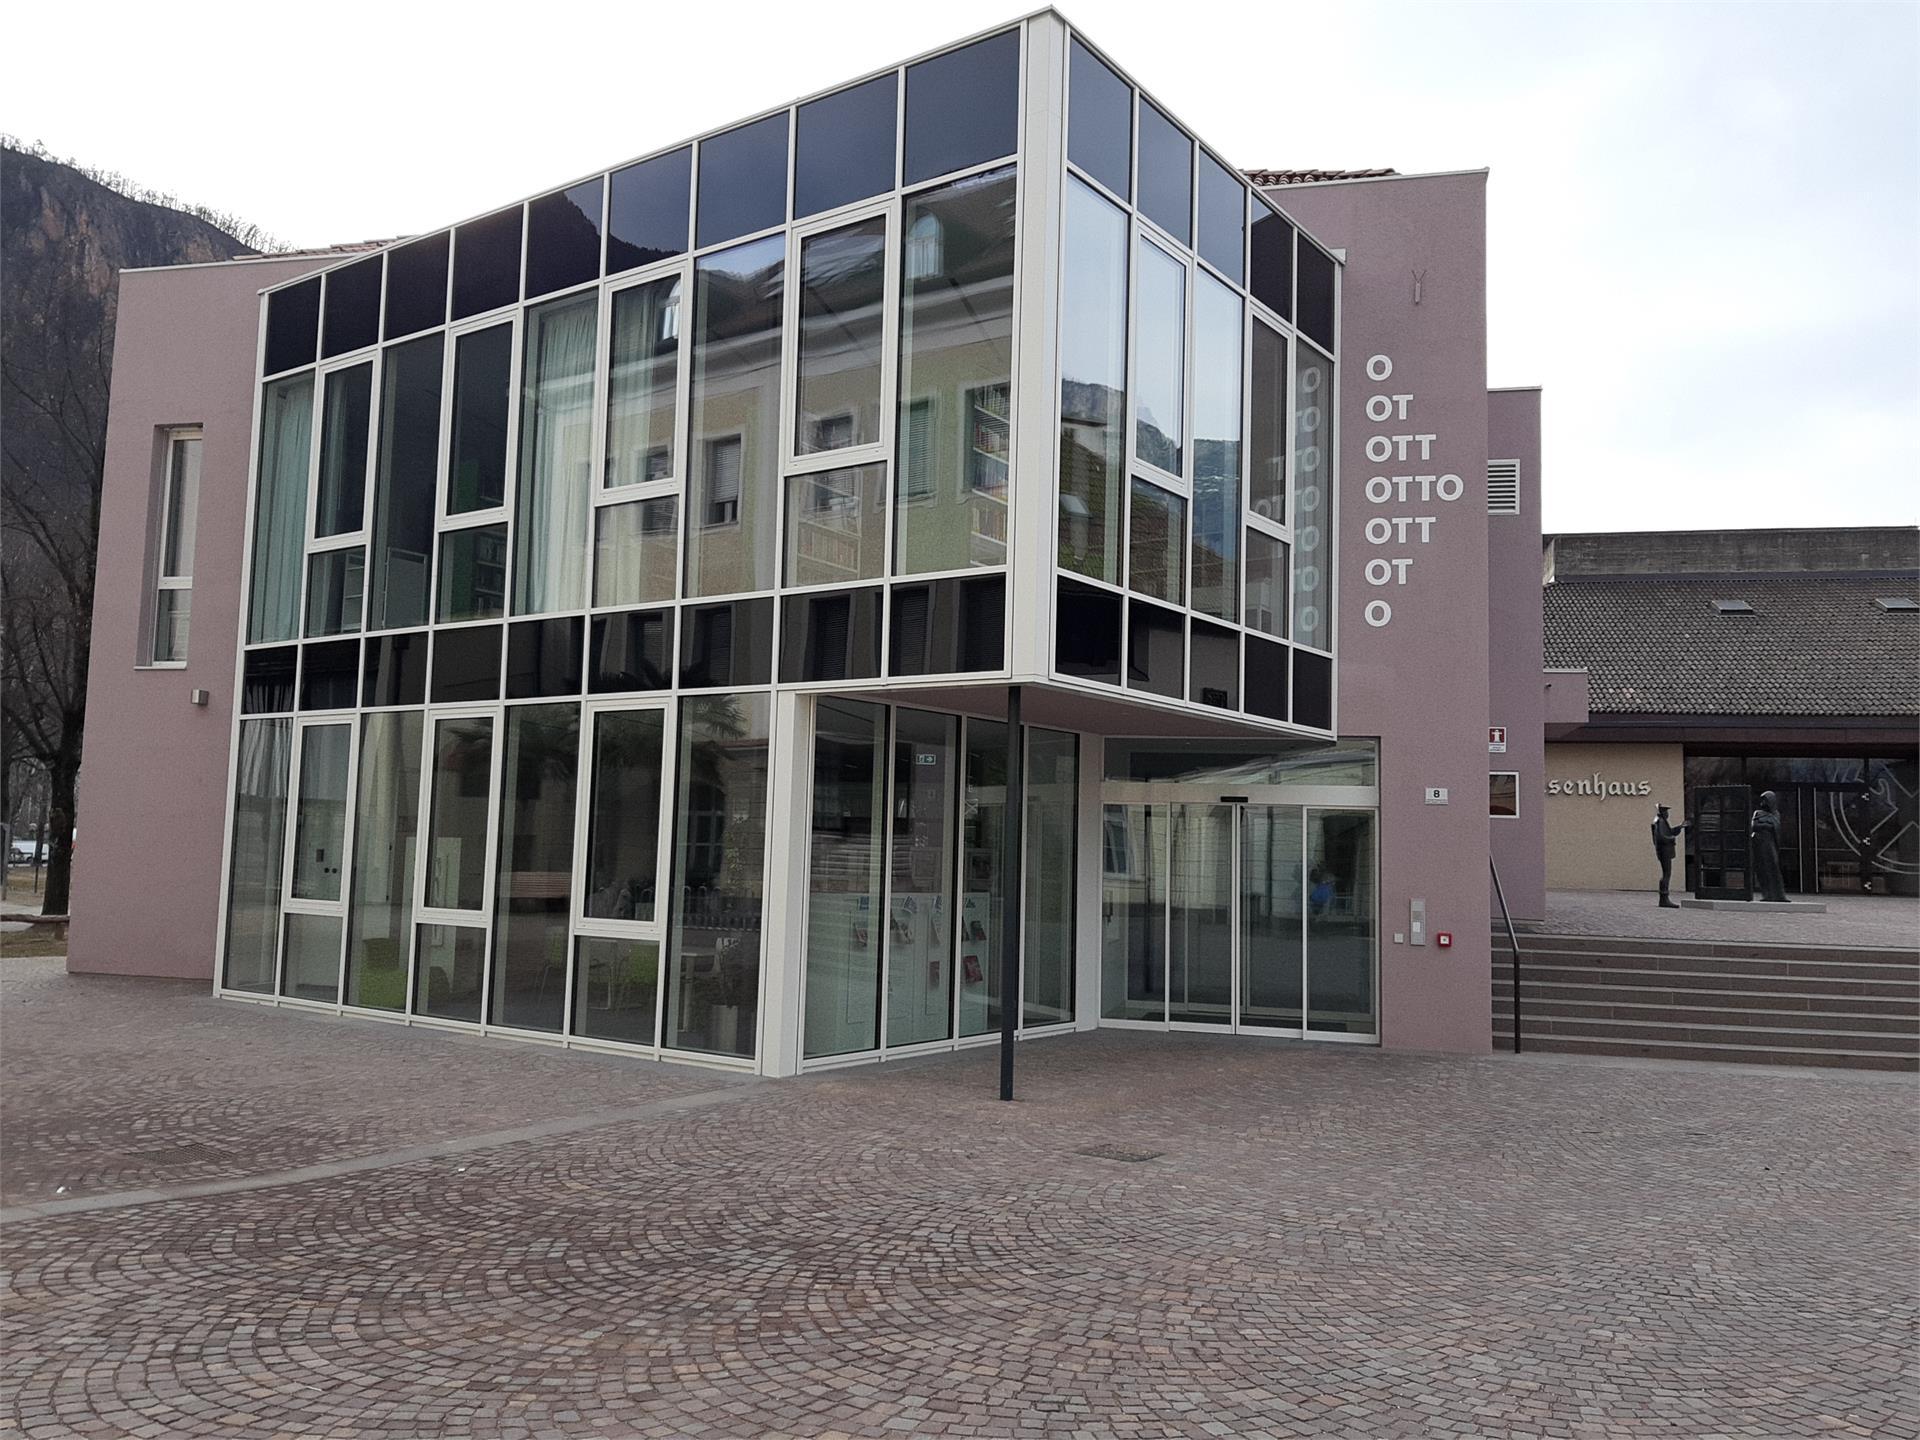 Library Terlano/Terlan OTTO